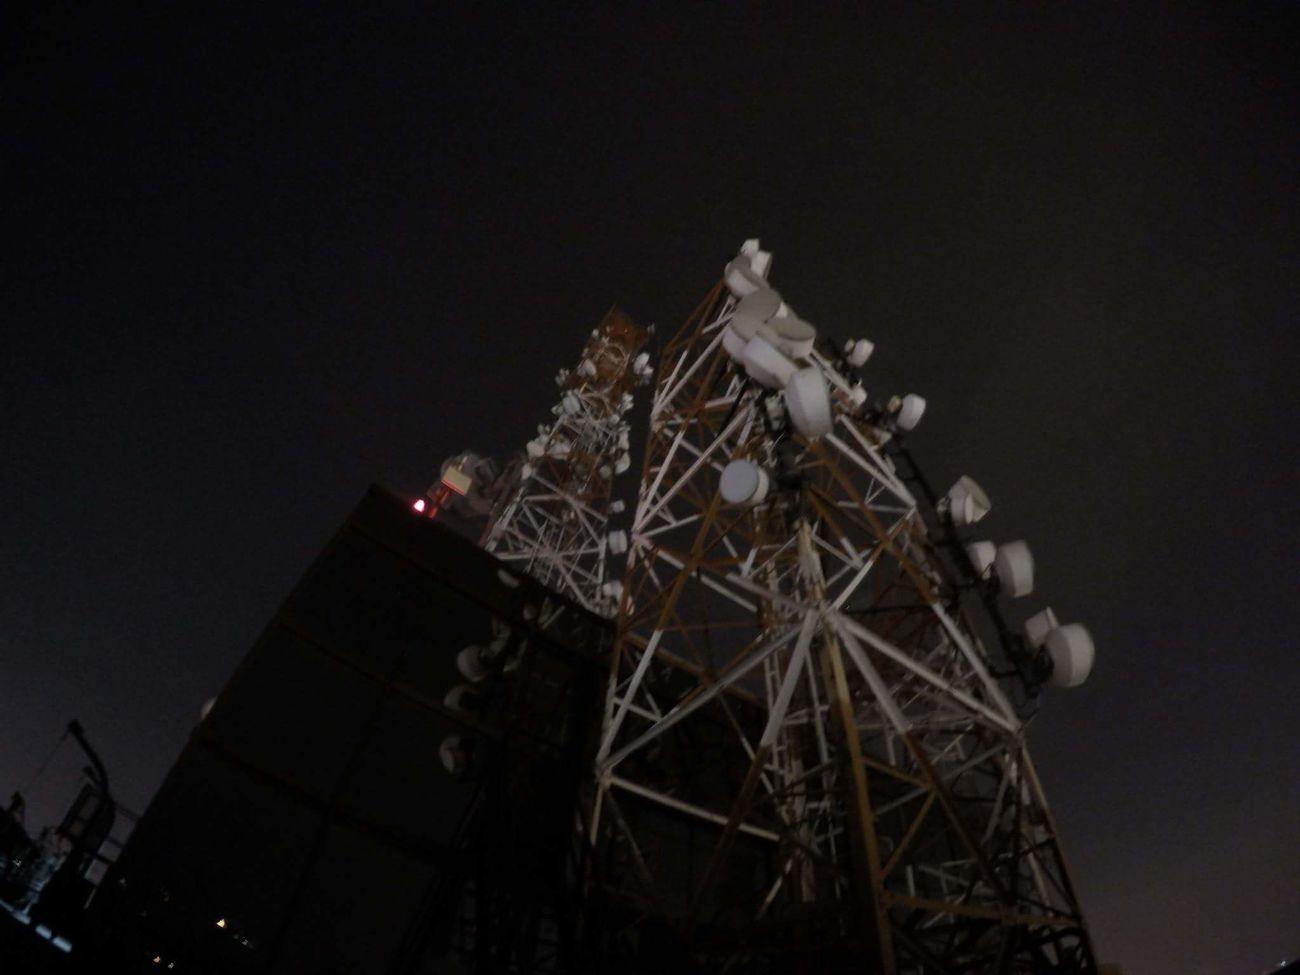 Radio Antenna Colombia Gopro Goprohero4 Gopro Shots Goprophotography Goprouniverse GoPrography